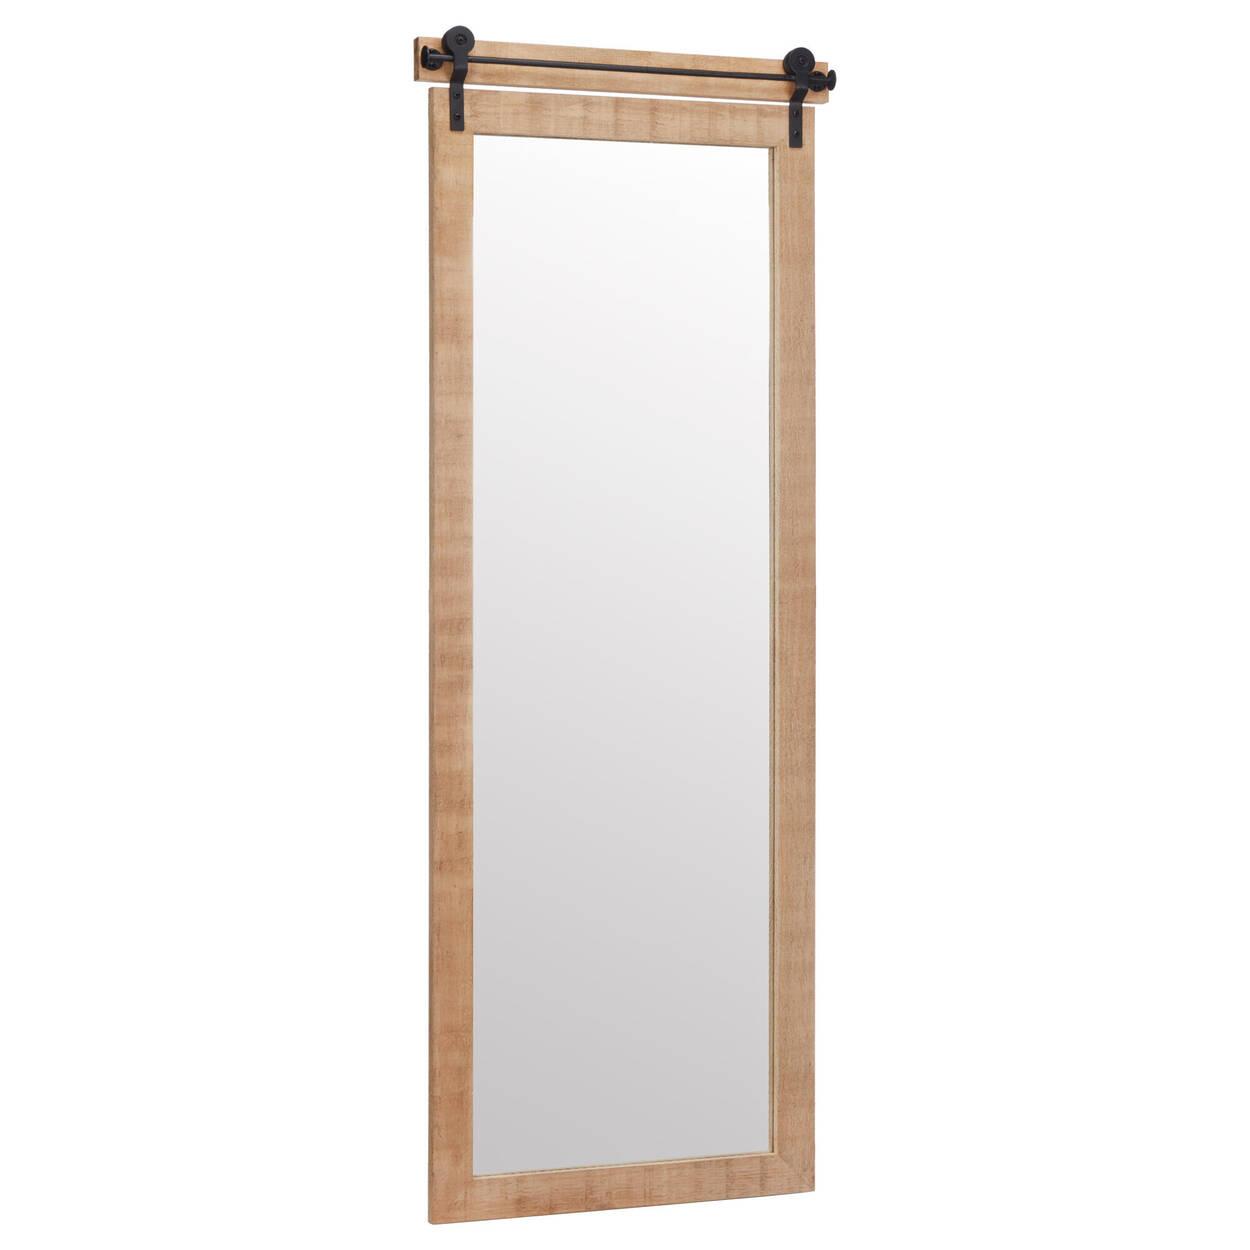 Miroir style porte de grange ton naturel